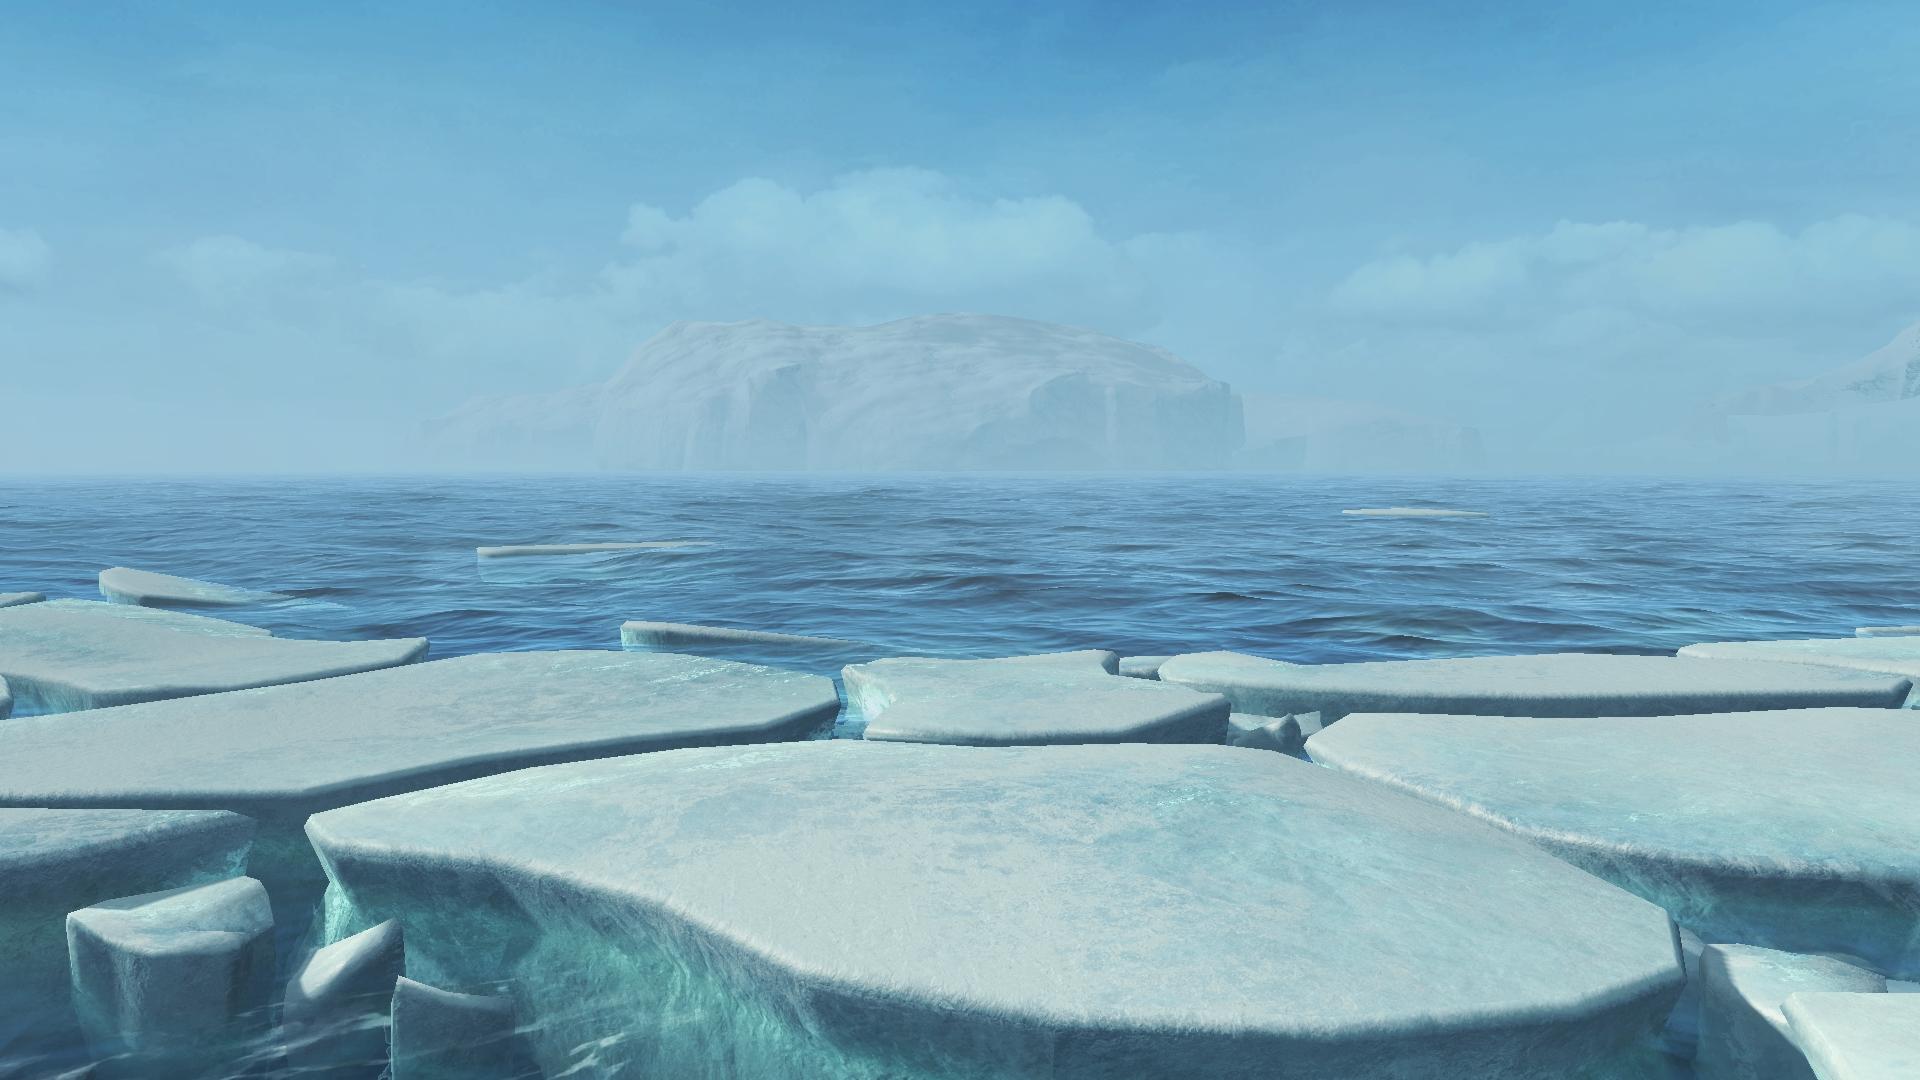 Arctic Ocean Png & Free Arctic Ocean.png Transparent Images #4262.